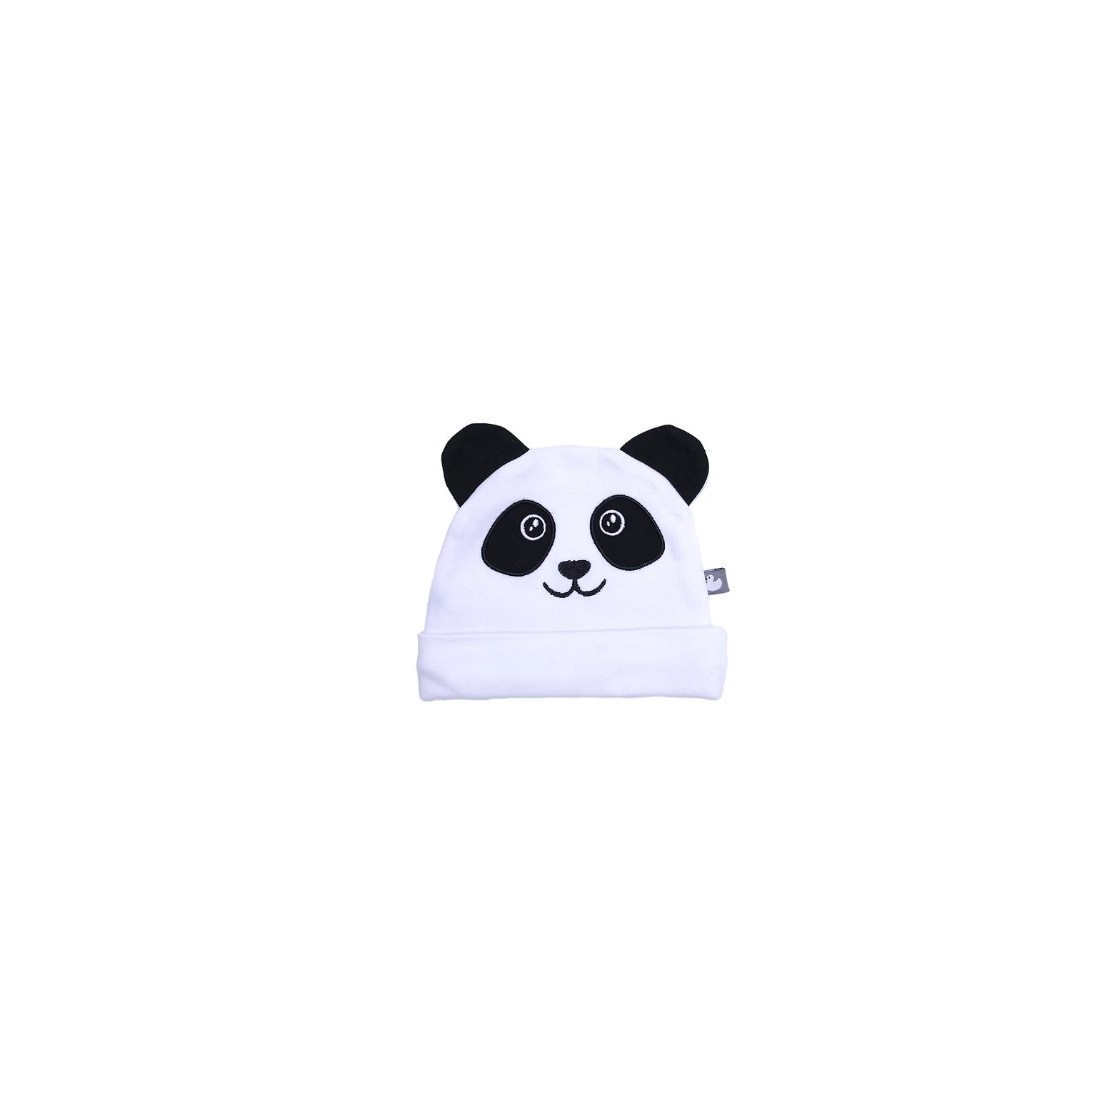 3ae1db7f8bb0 ... Bonnet bébé original chat, lapin ou panda